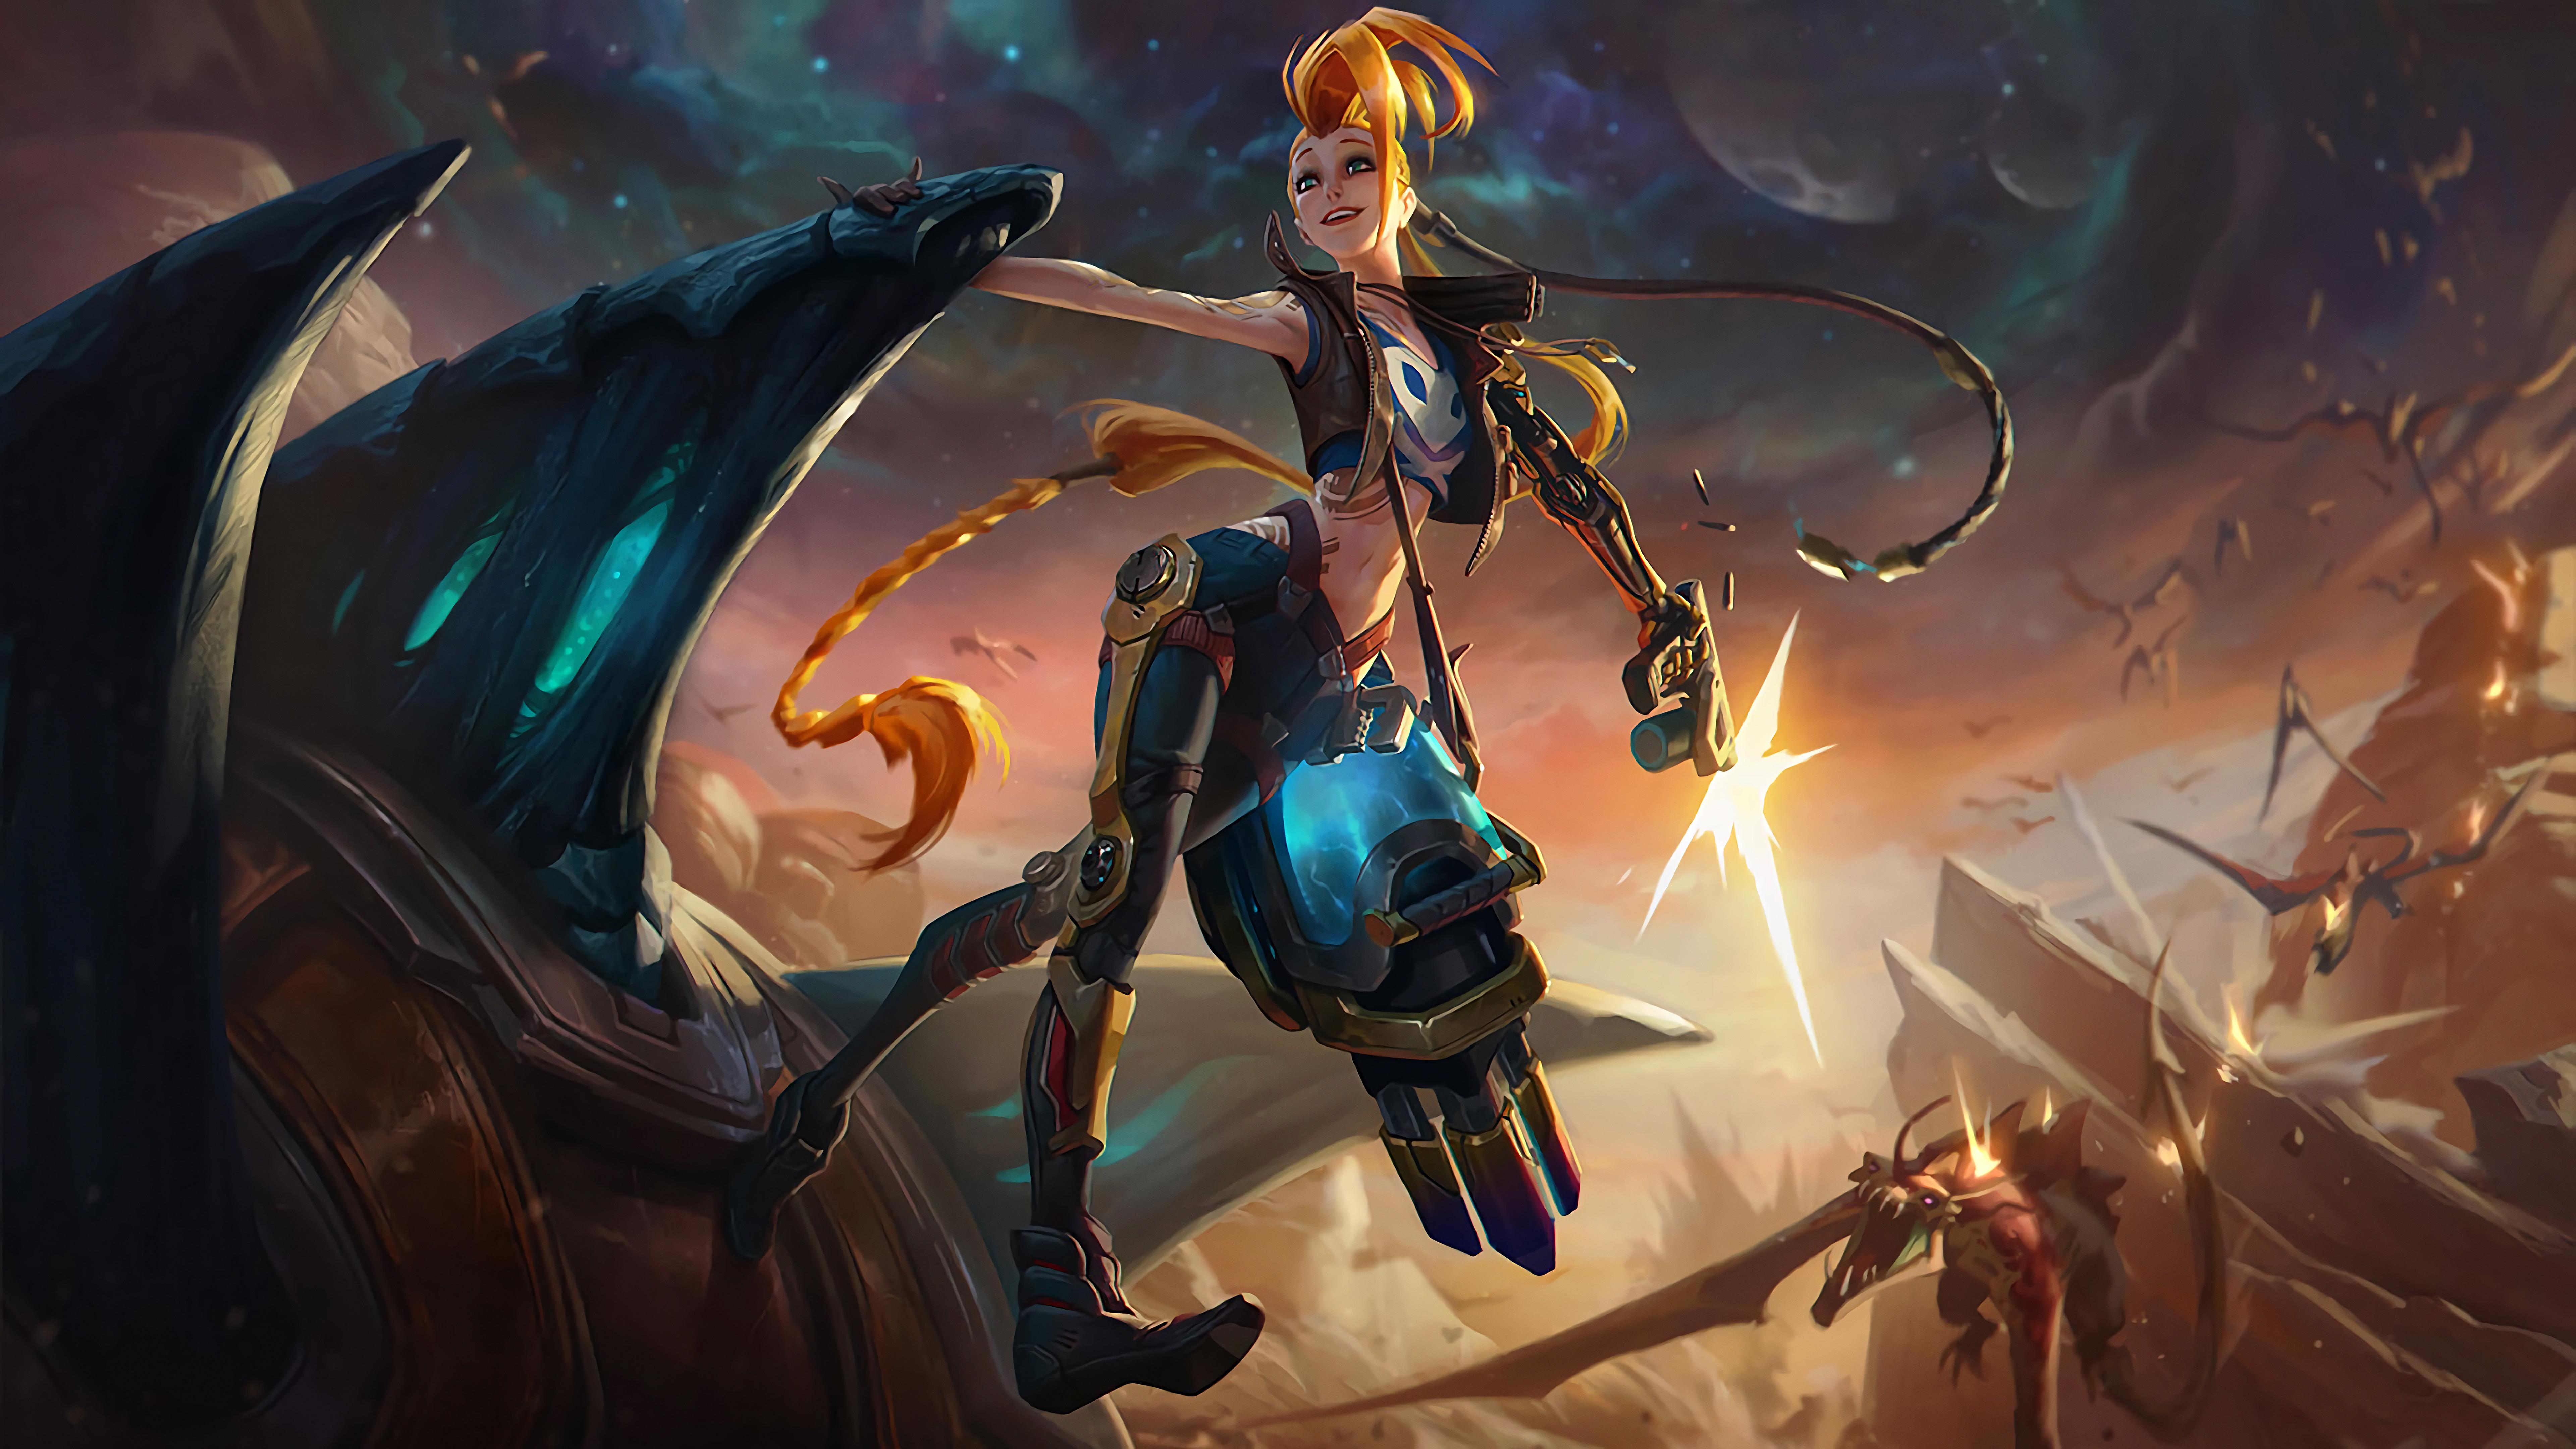 Jinx League Of Legends 8k Hd Games 4k Wallpapers Images